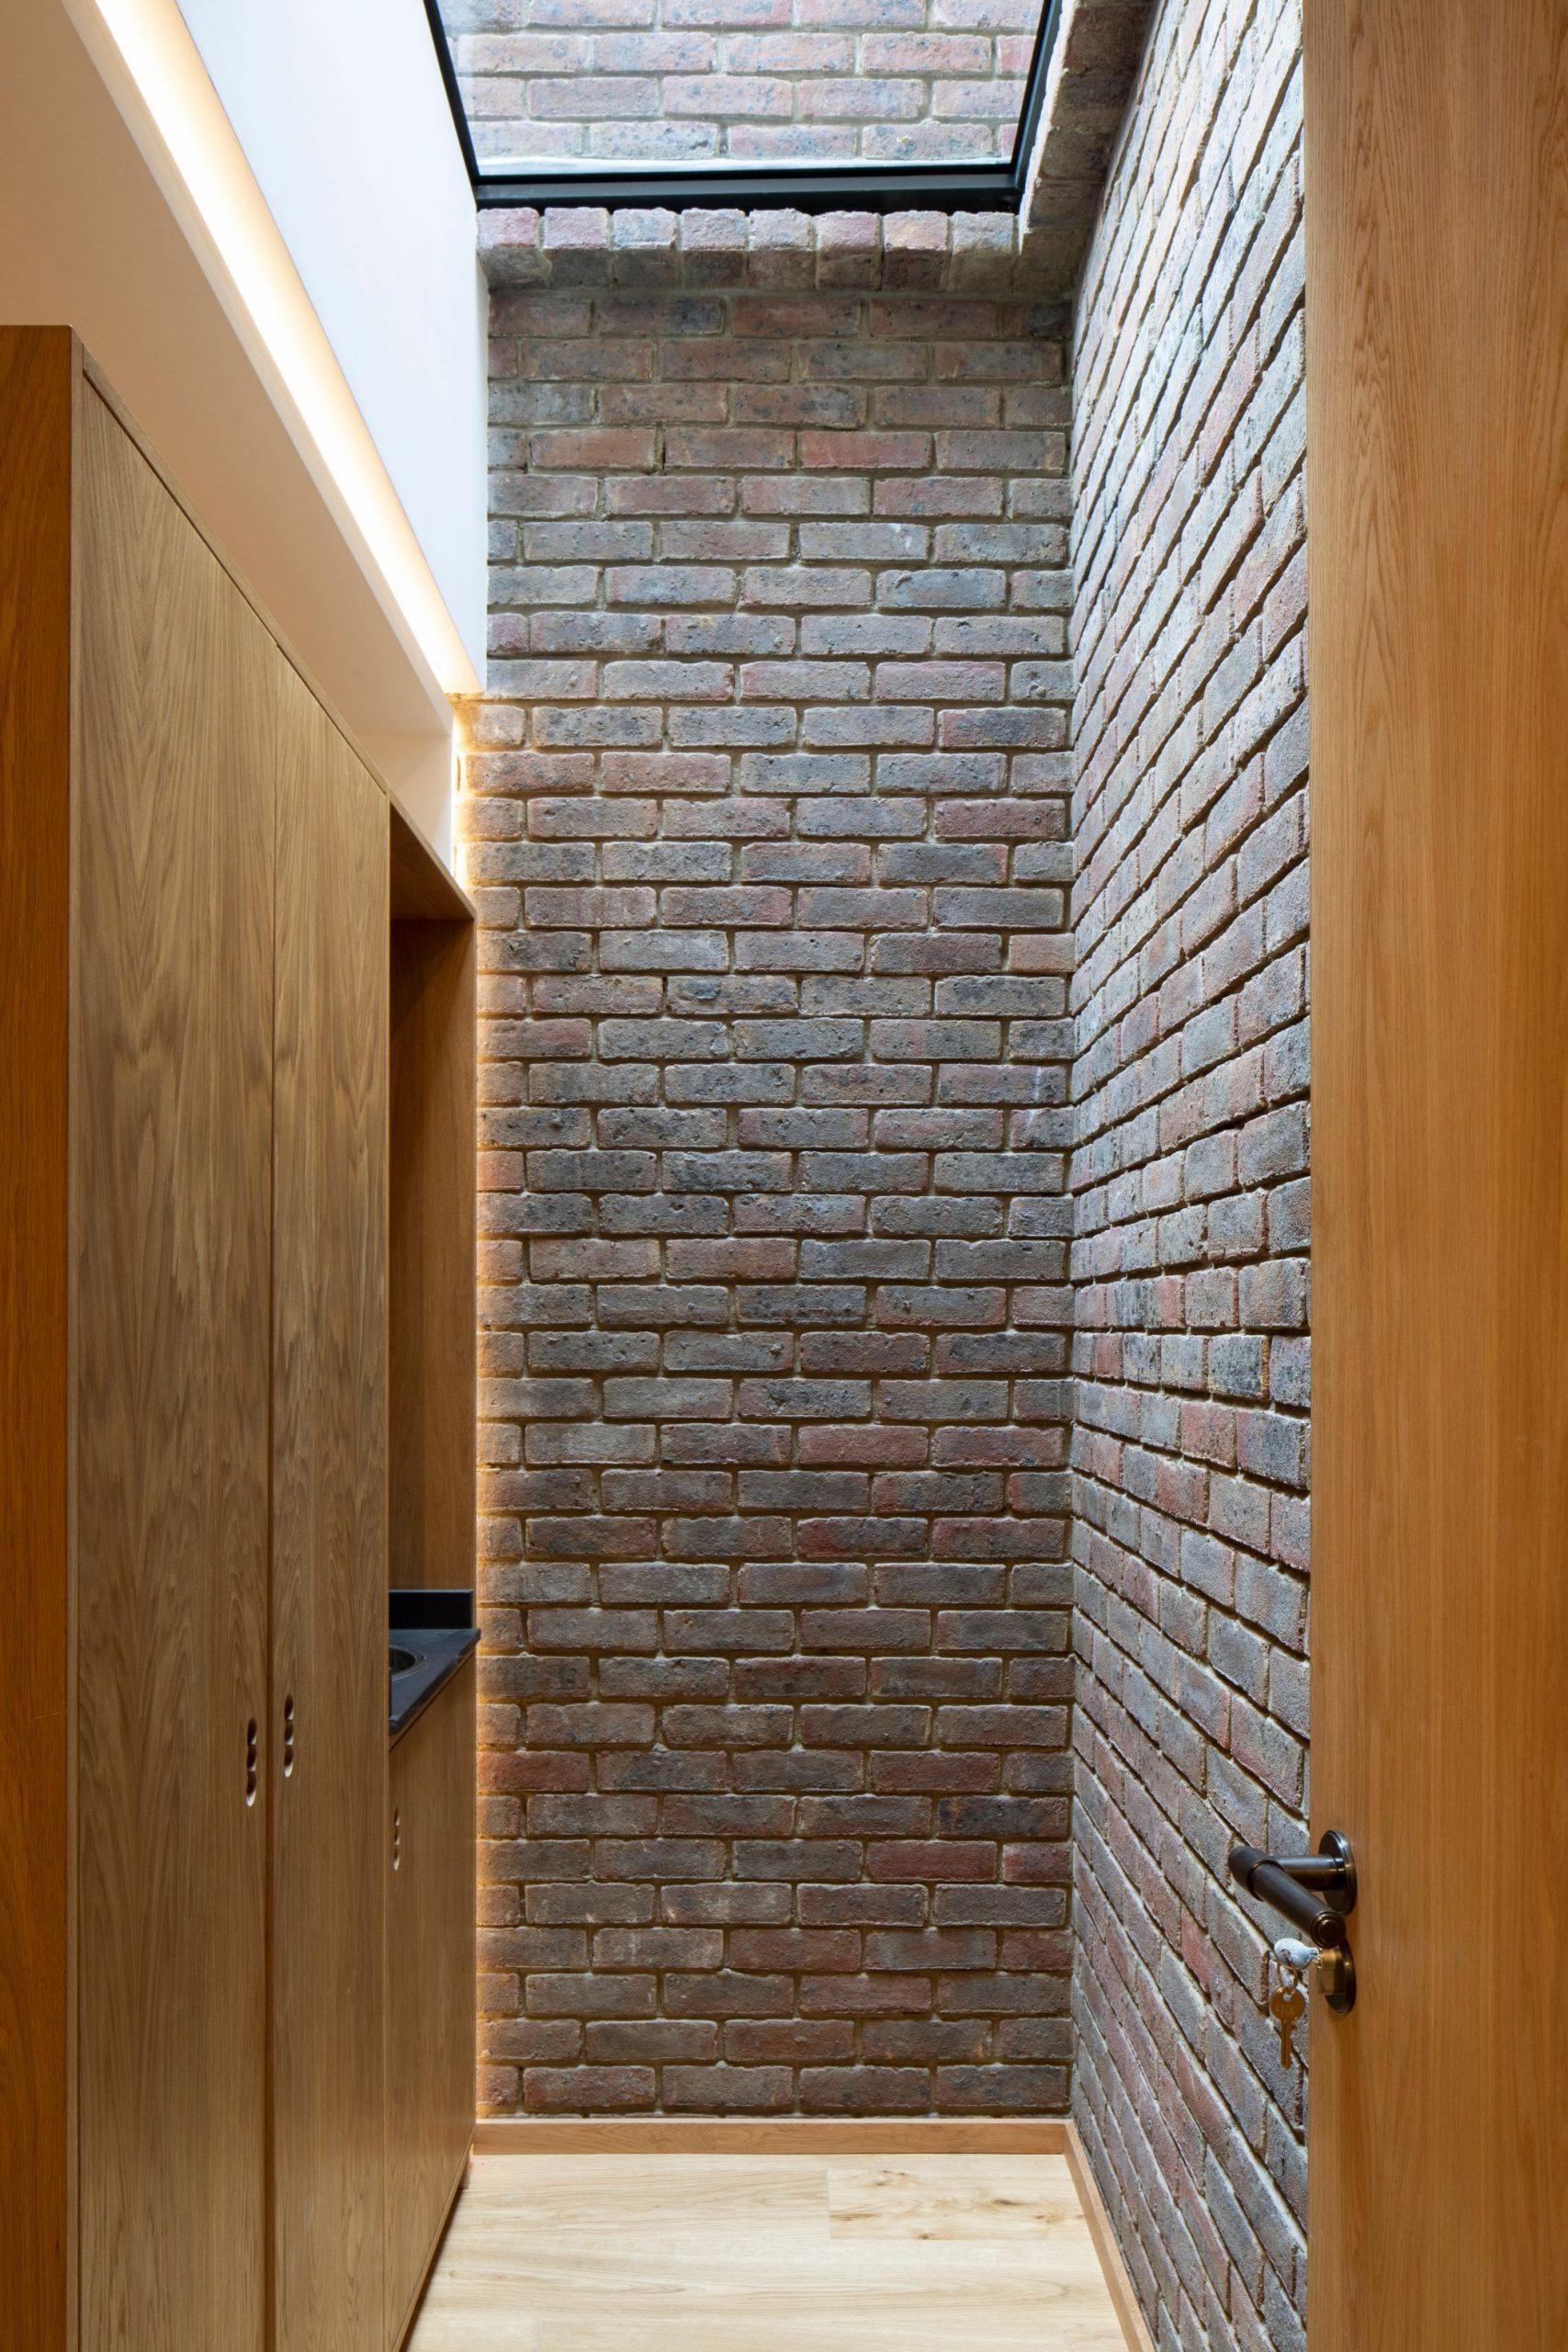 Brick_house35